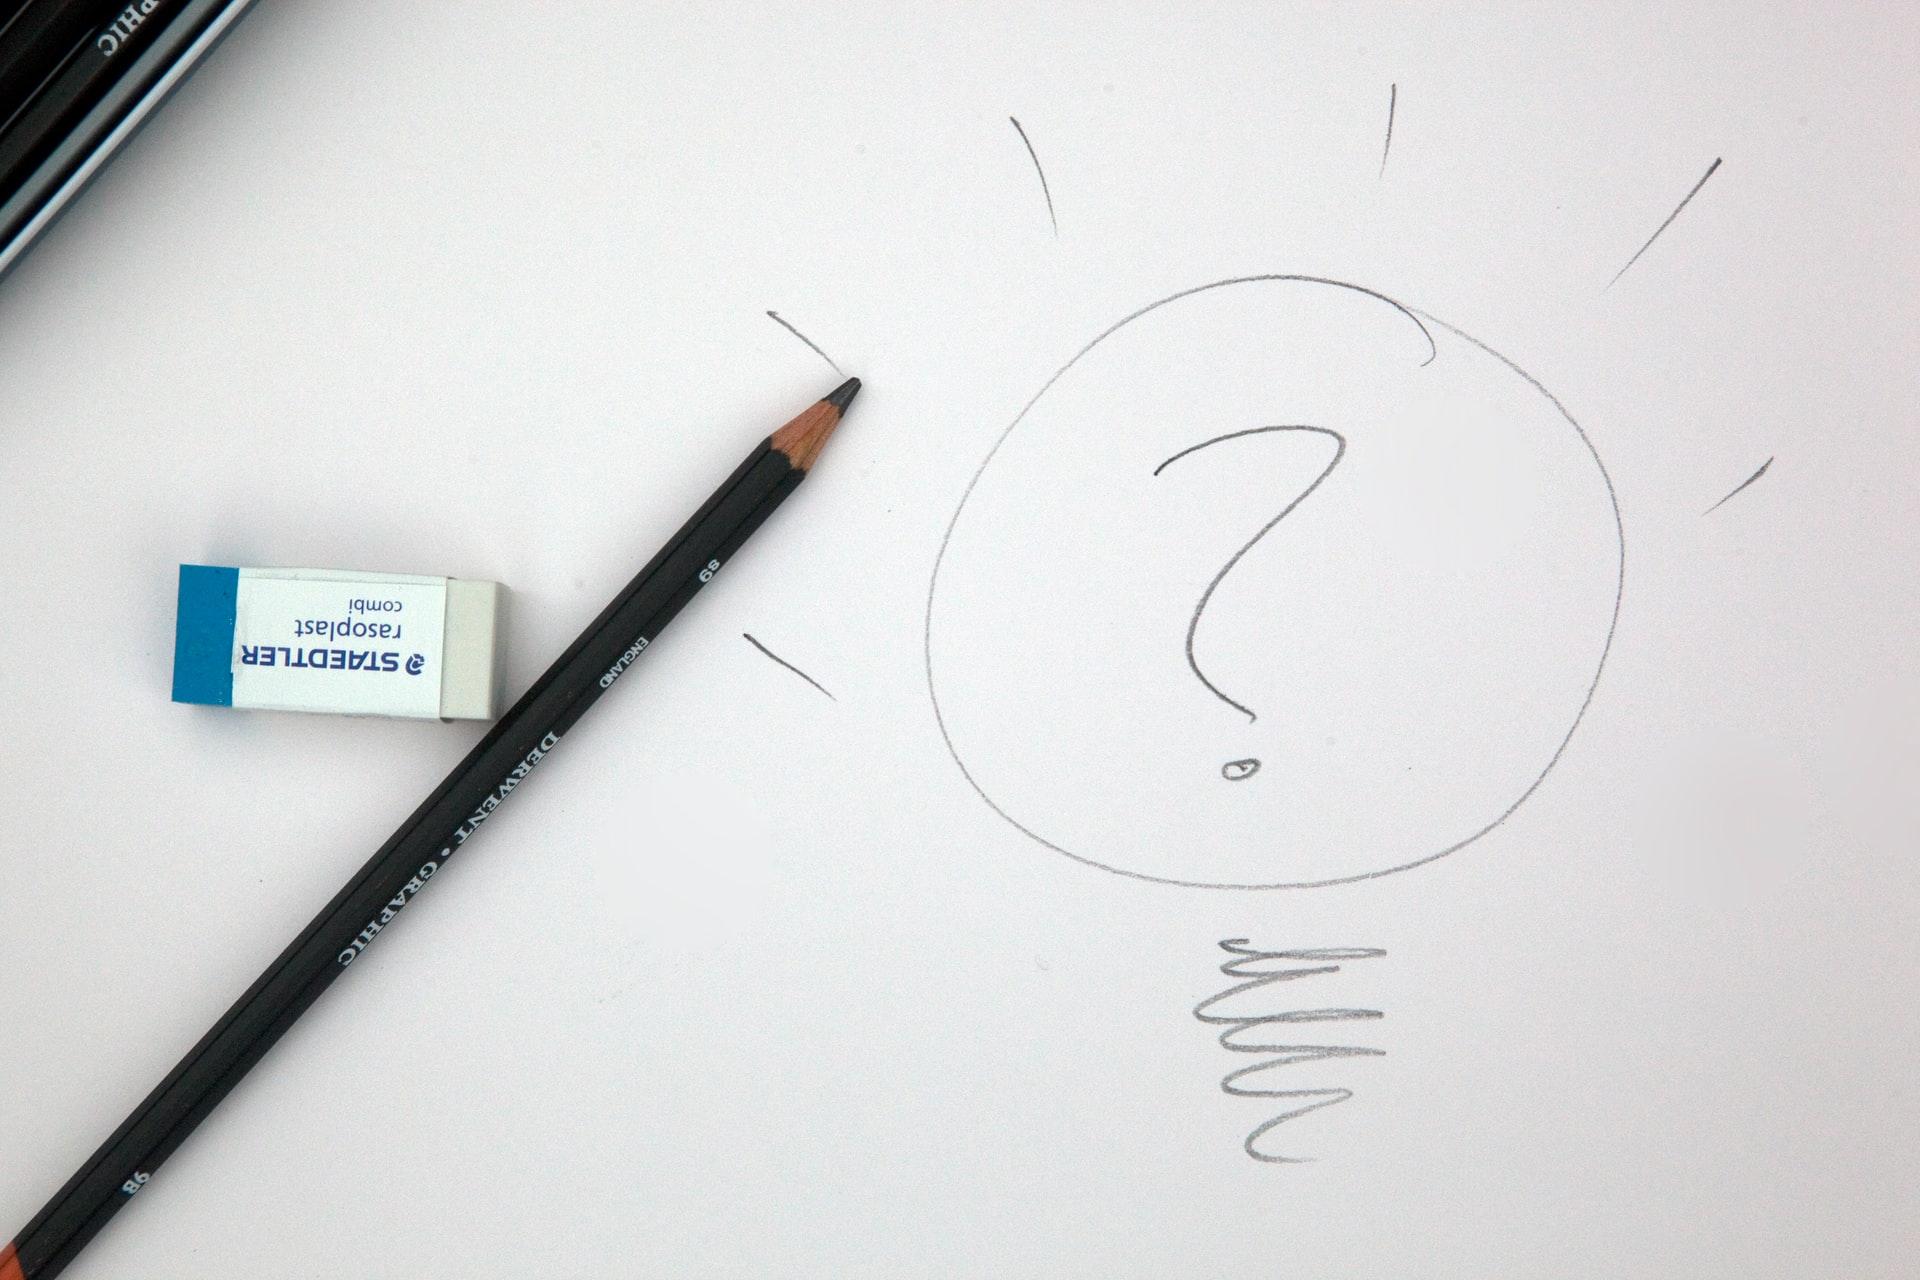 Digital Marketing: 7 Strategies to Stick To in 2021